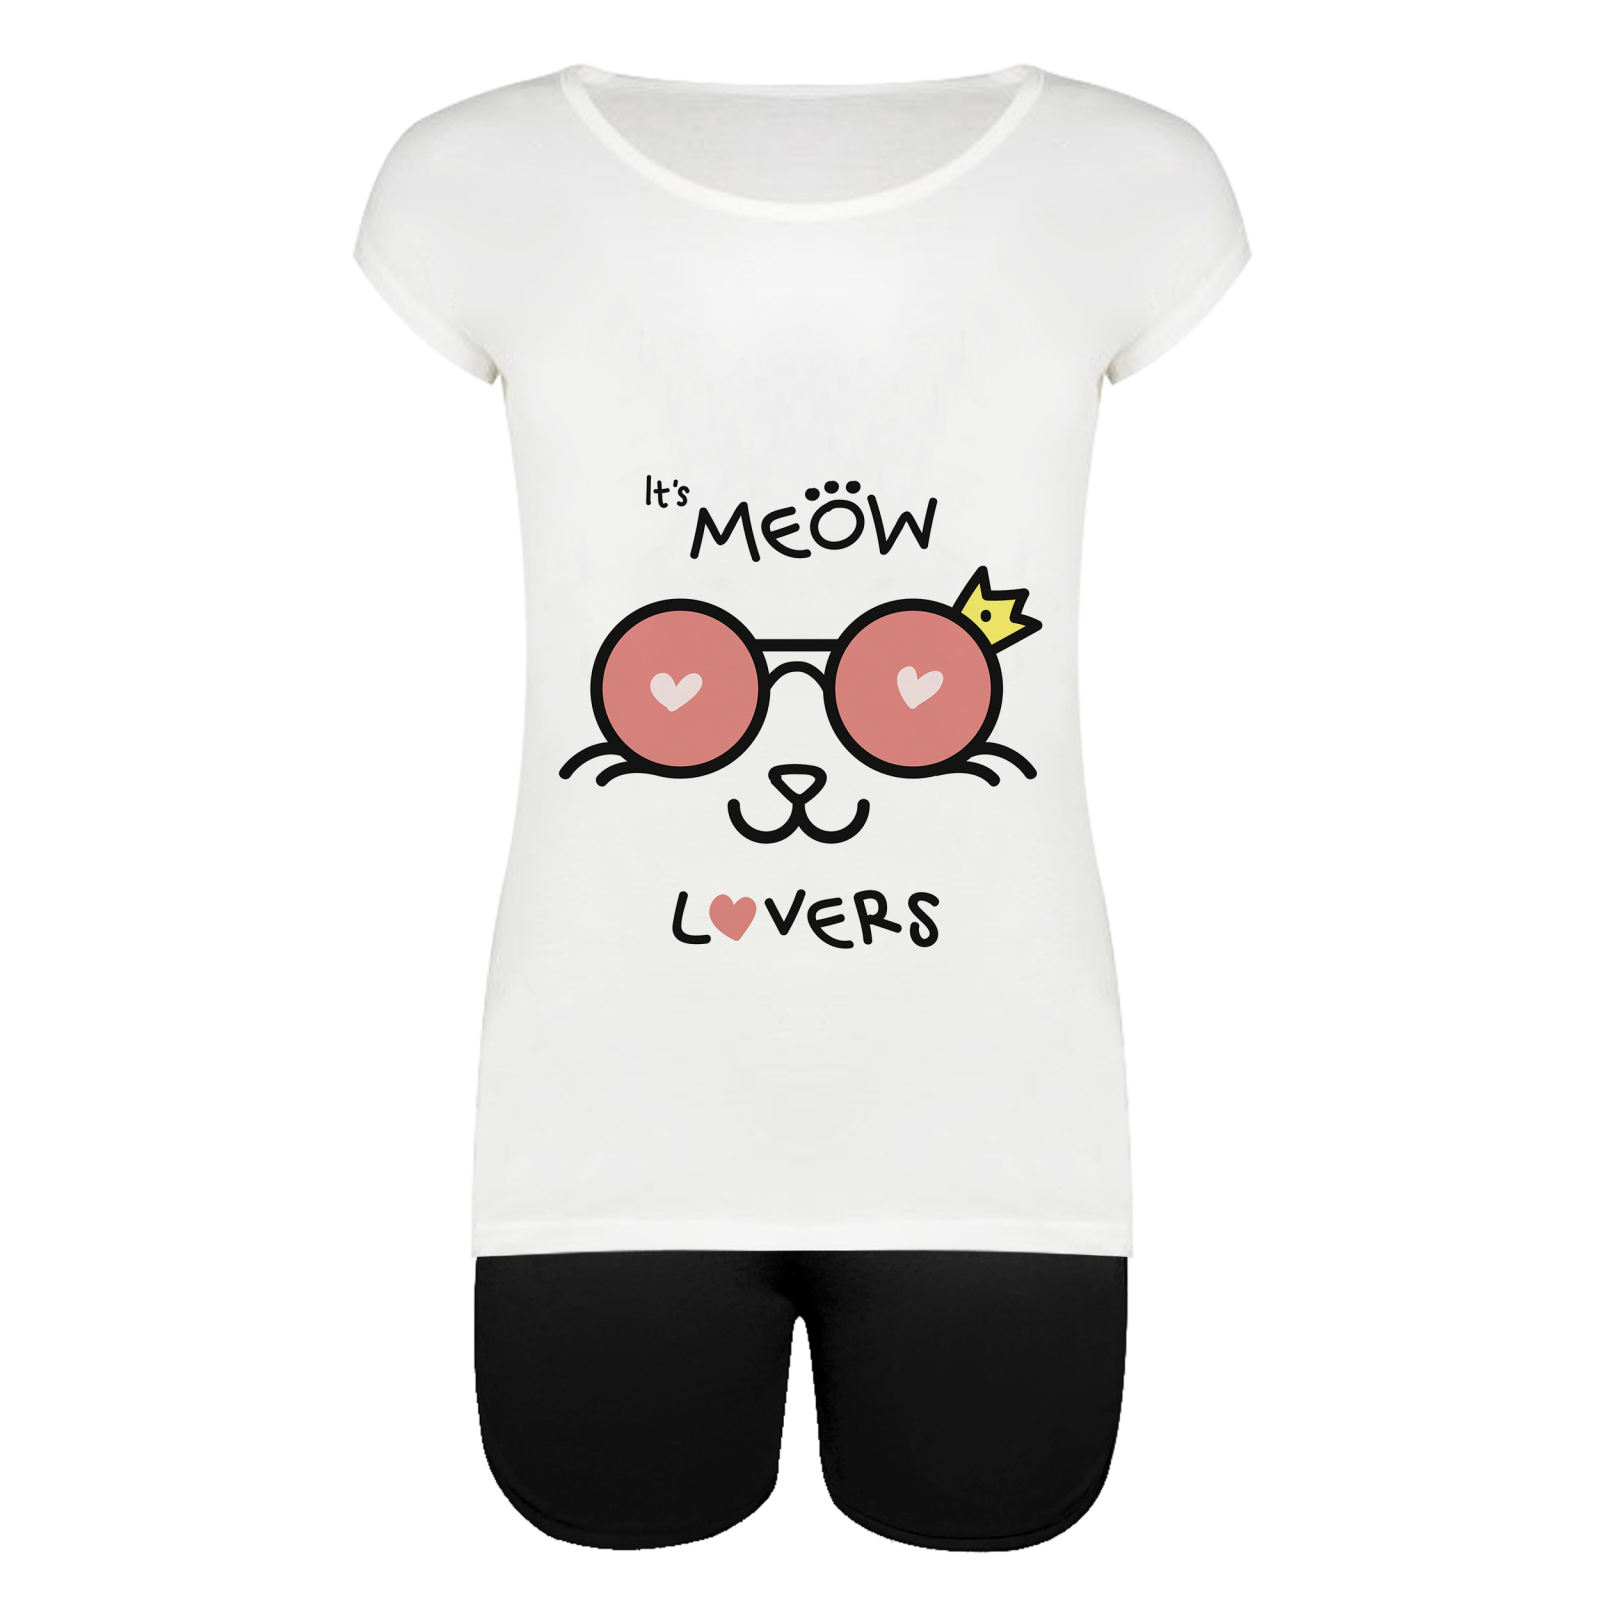 ست تیشرت و شلوارک زنانه طرح Meow Cat کد 1000049 -  - 2